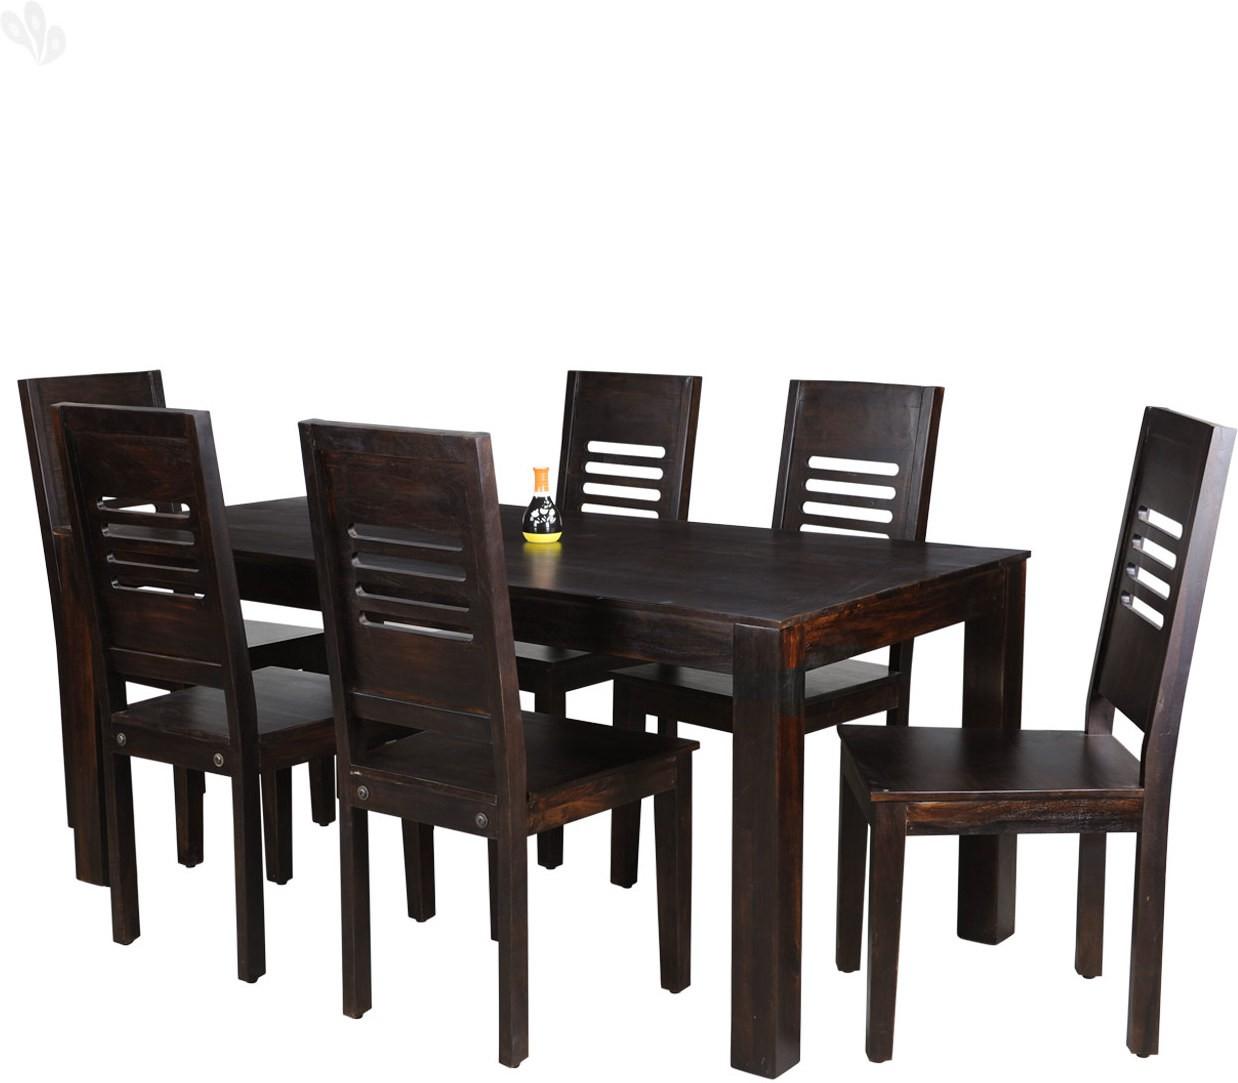 Surprising Buy Royal Oak Jade Solid Wood Dining Set Finish Color Dark Home Interior And Landscaping Ologienasavecom